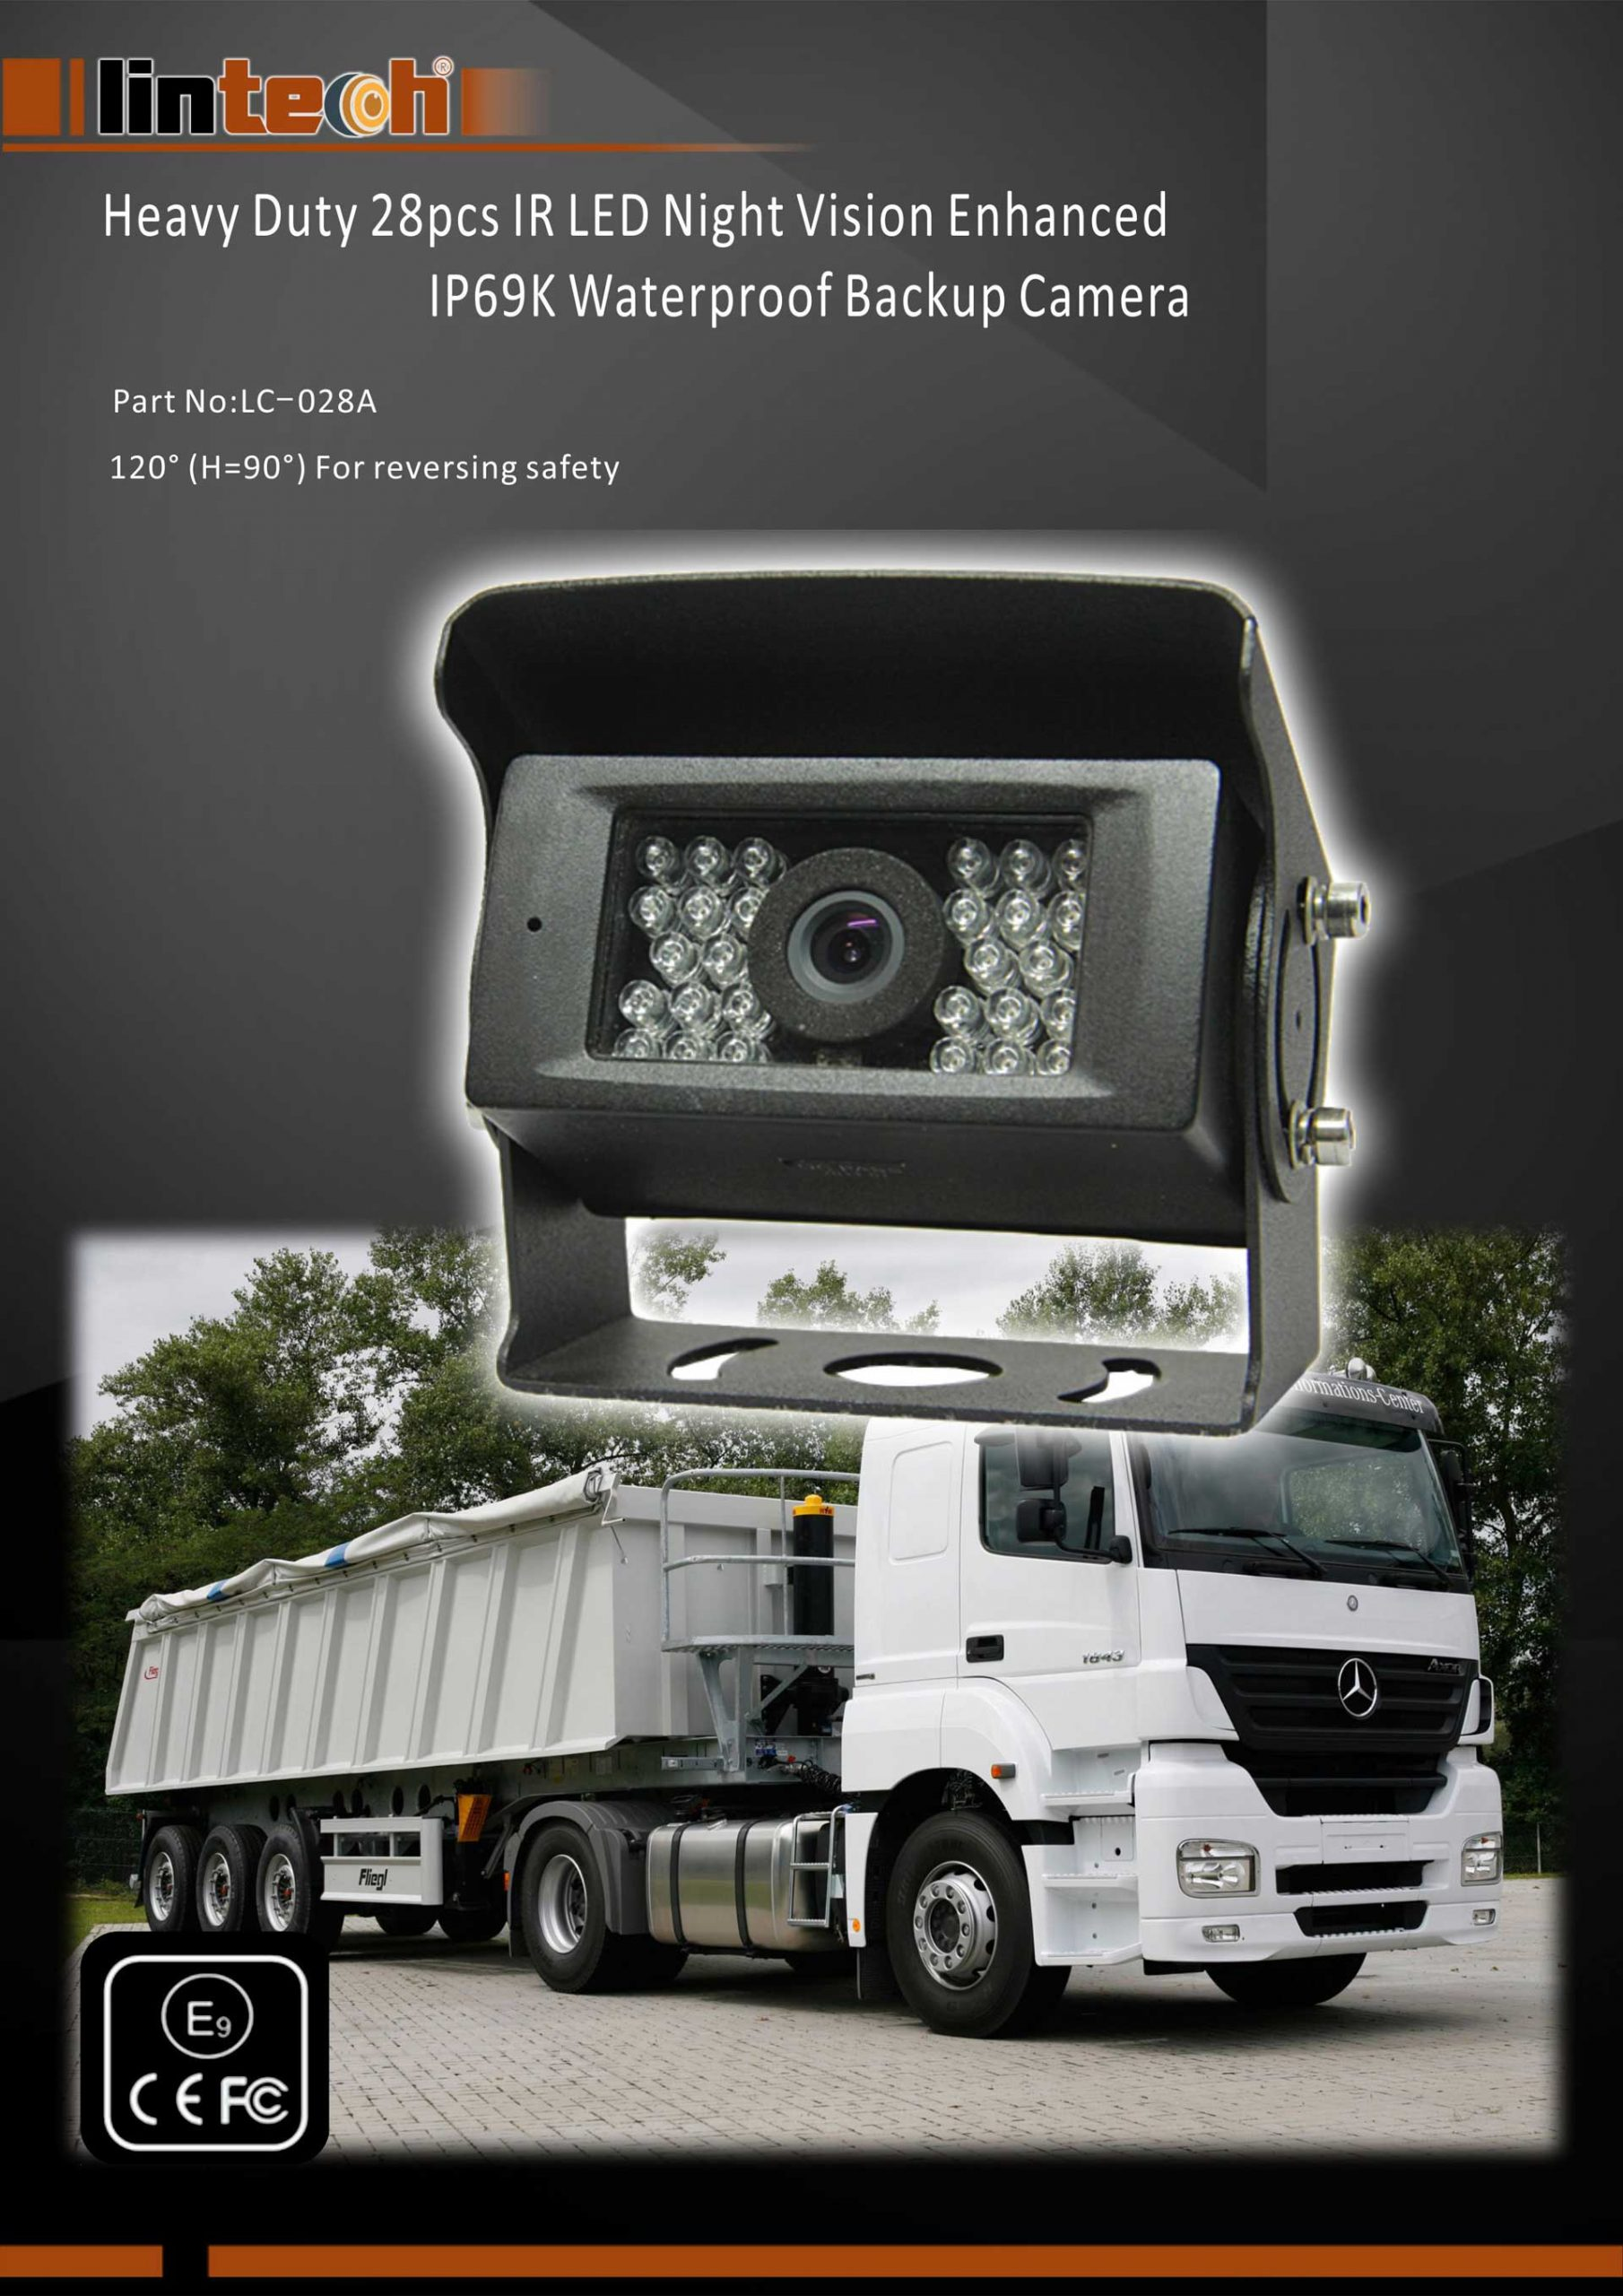 1.Heavy Duty 28pcs IR LED Night Vision Enhanced IP69 Waterproof Backup Camera